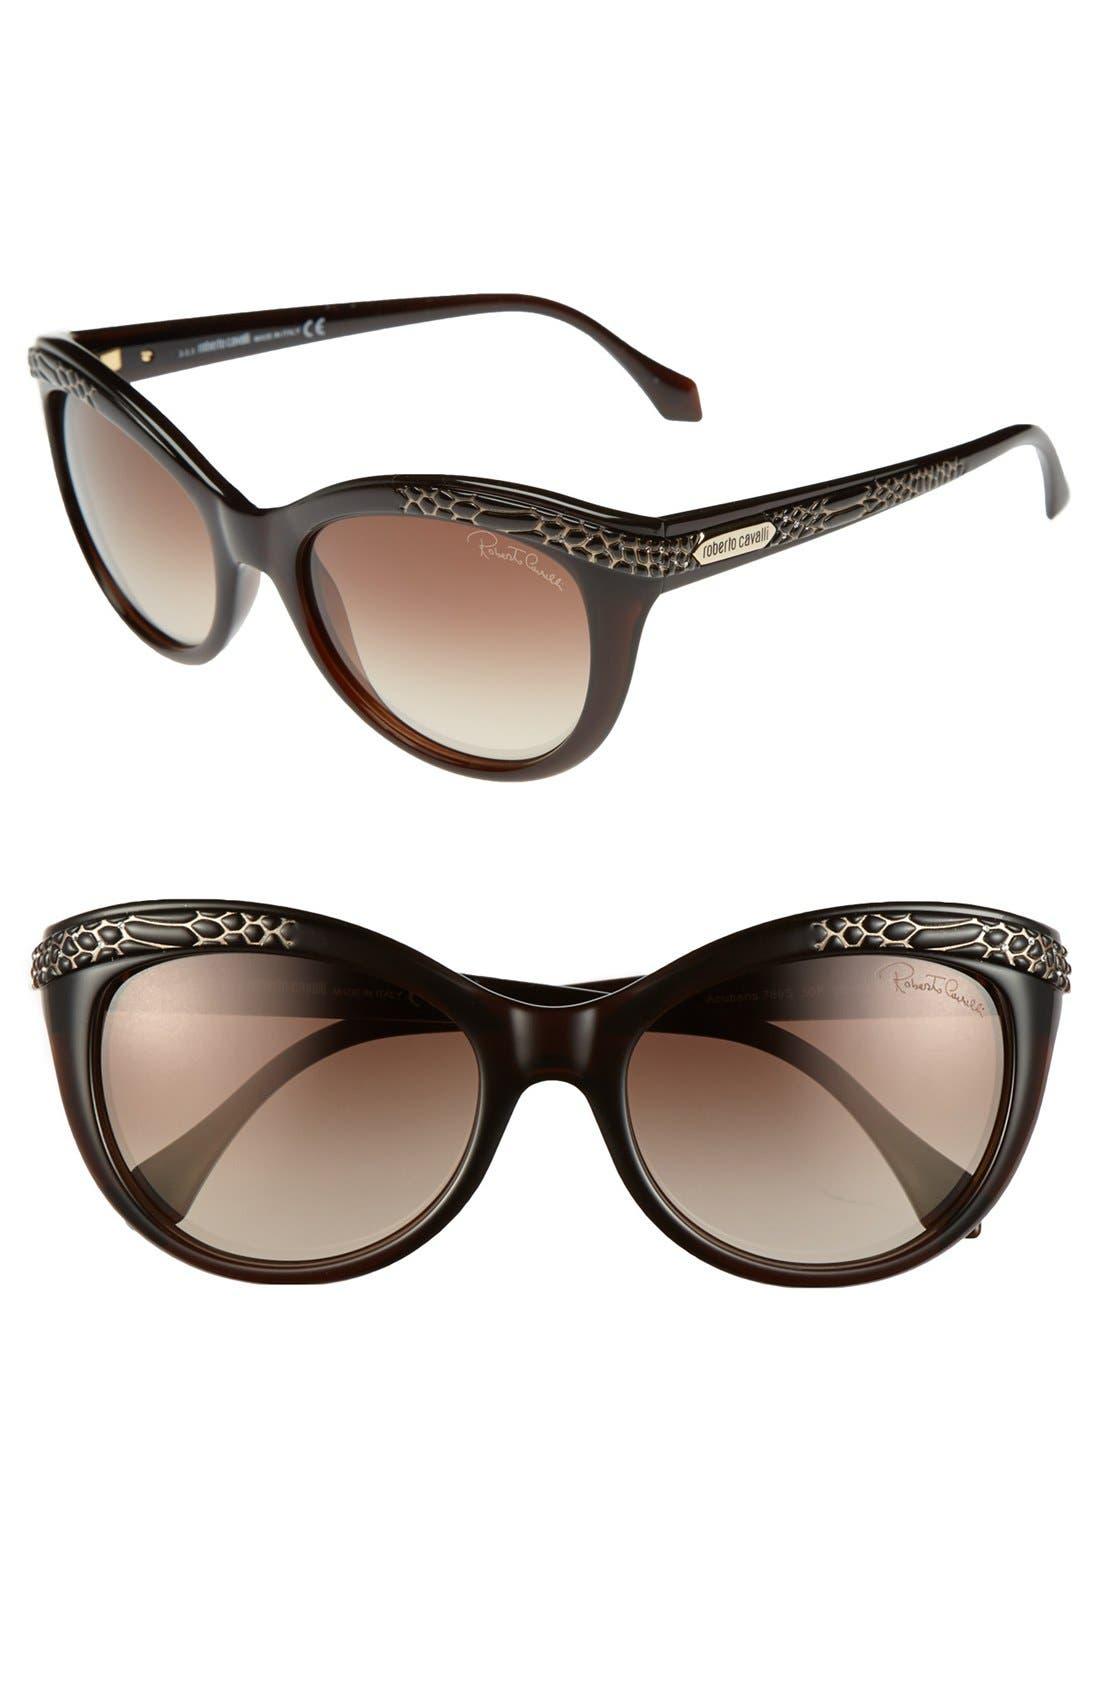 Alternate Image 1 Selected - Roberto Cavalli 'Acubens' 56mm Sunglasses